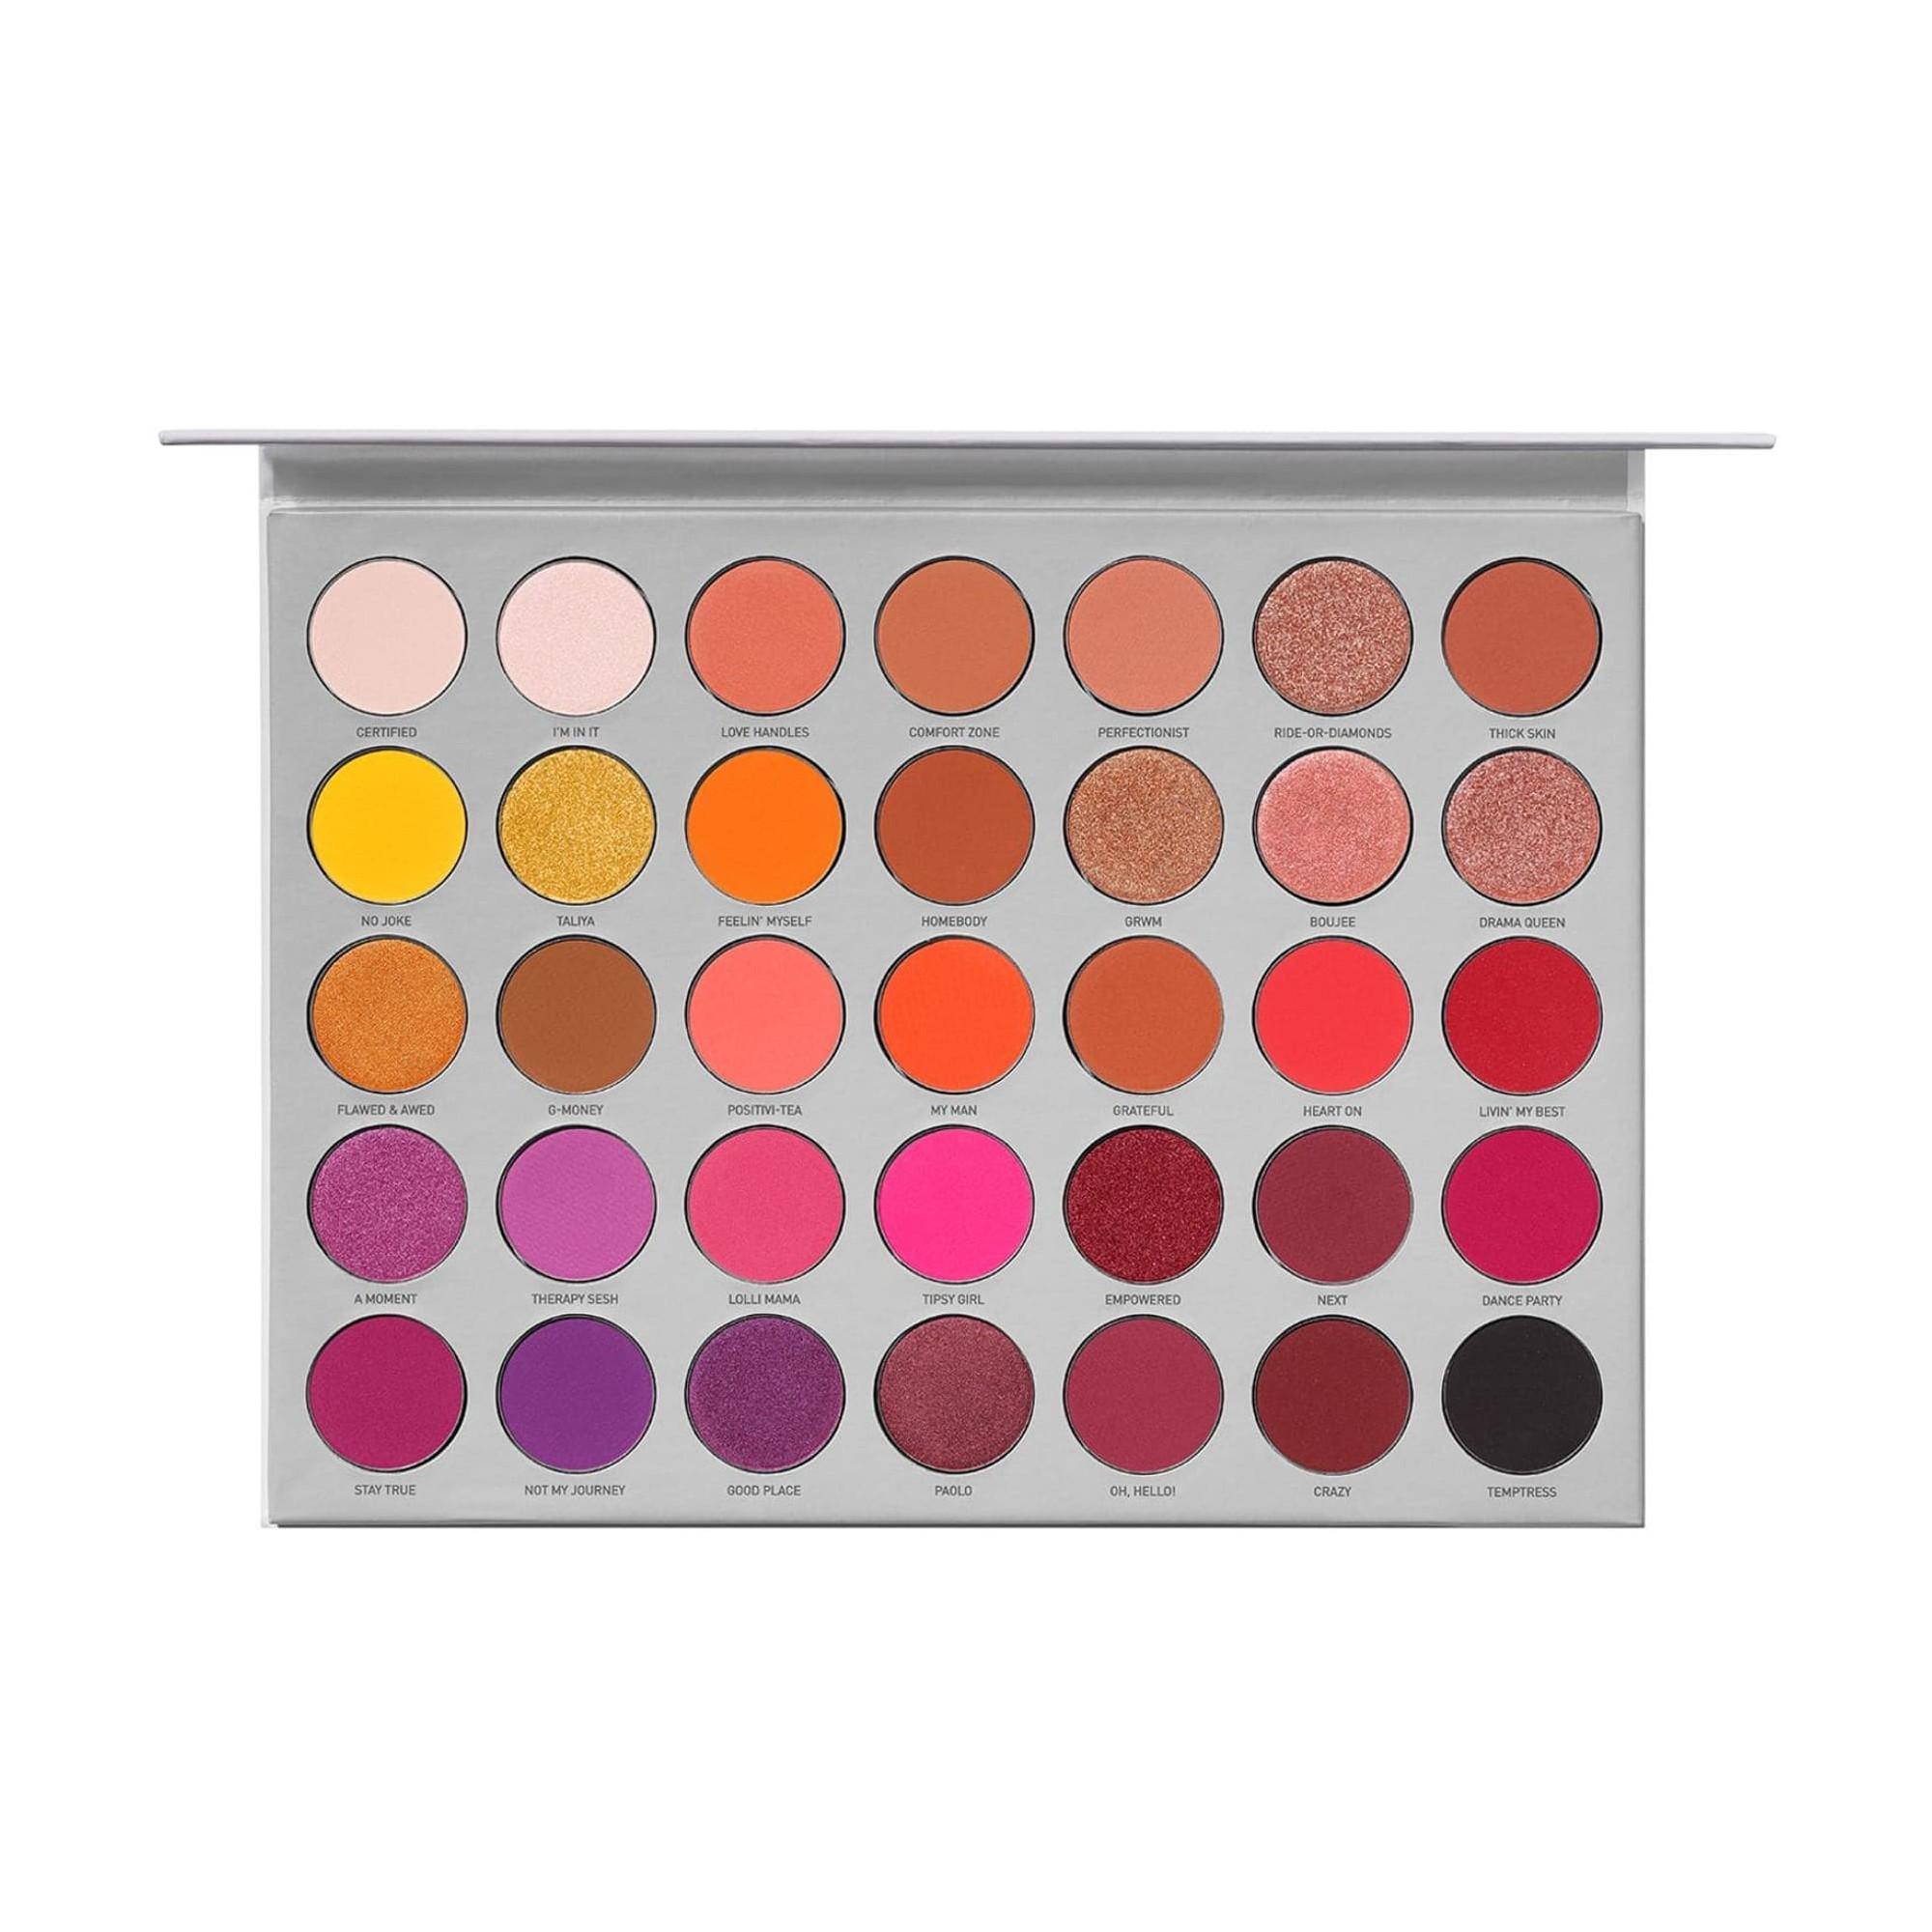 Morphe Brushes x Jaclyn Hill Eyeshadow Palette Volume II